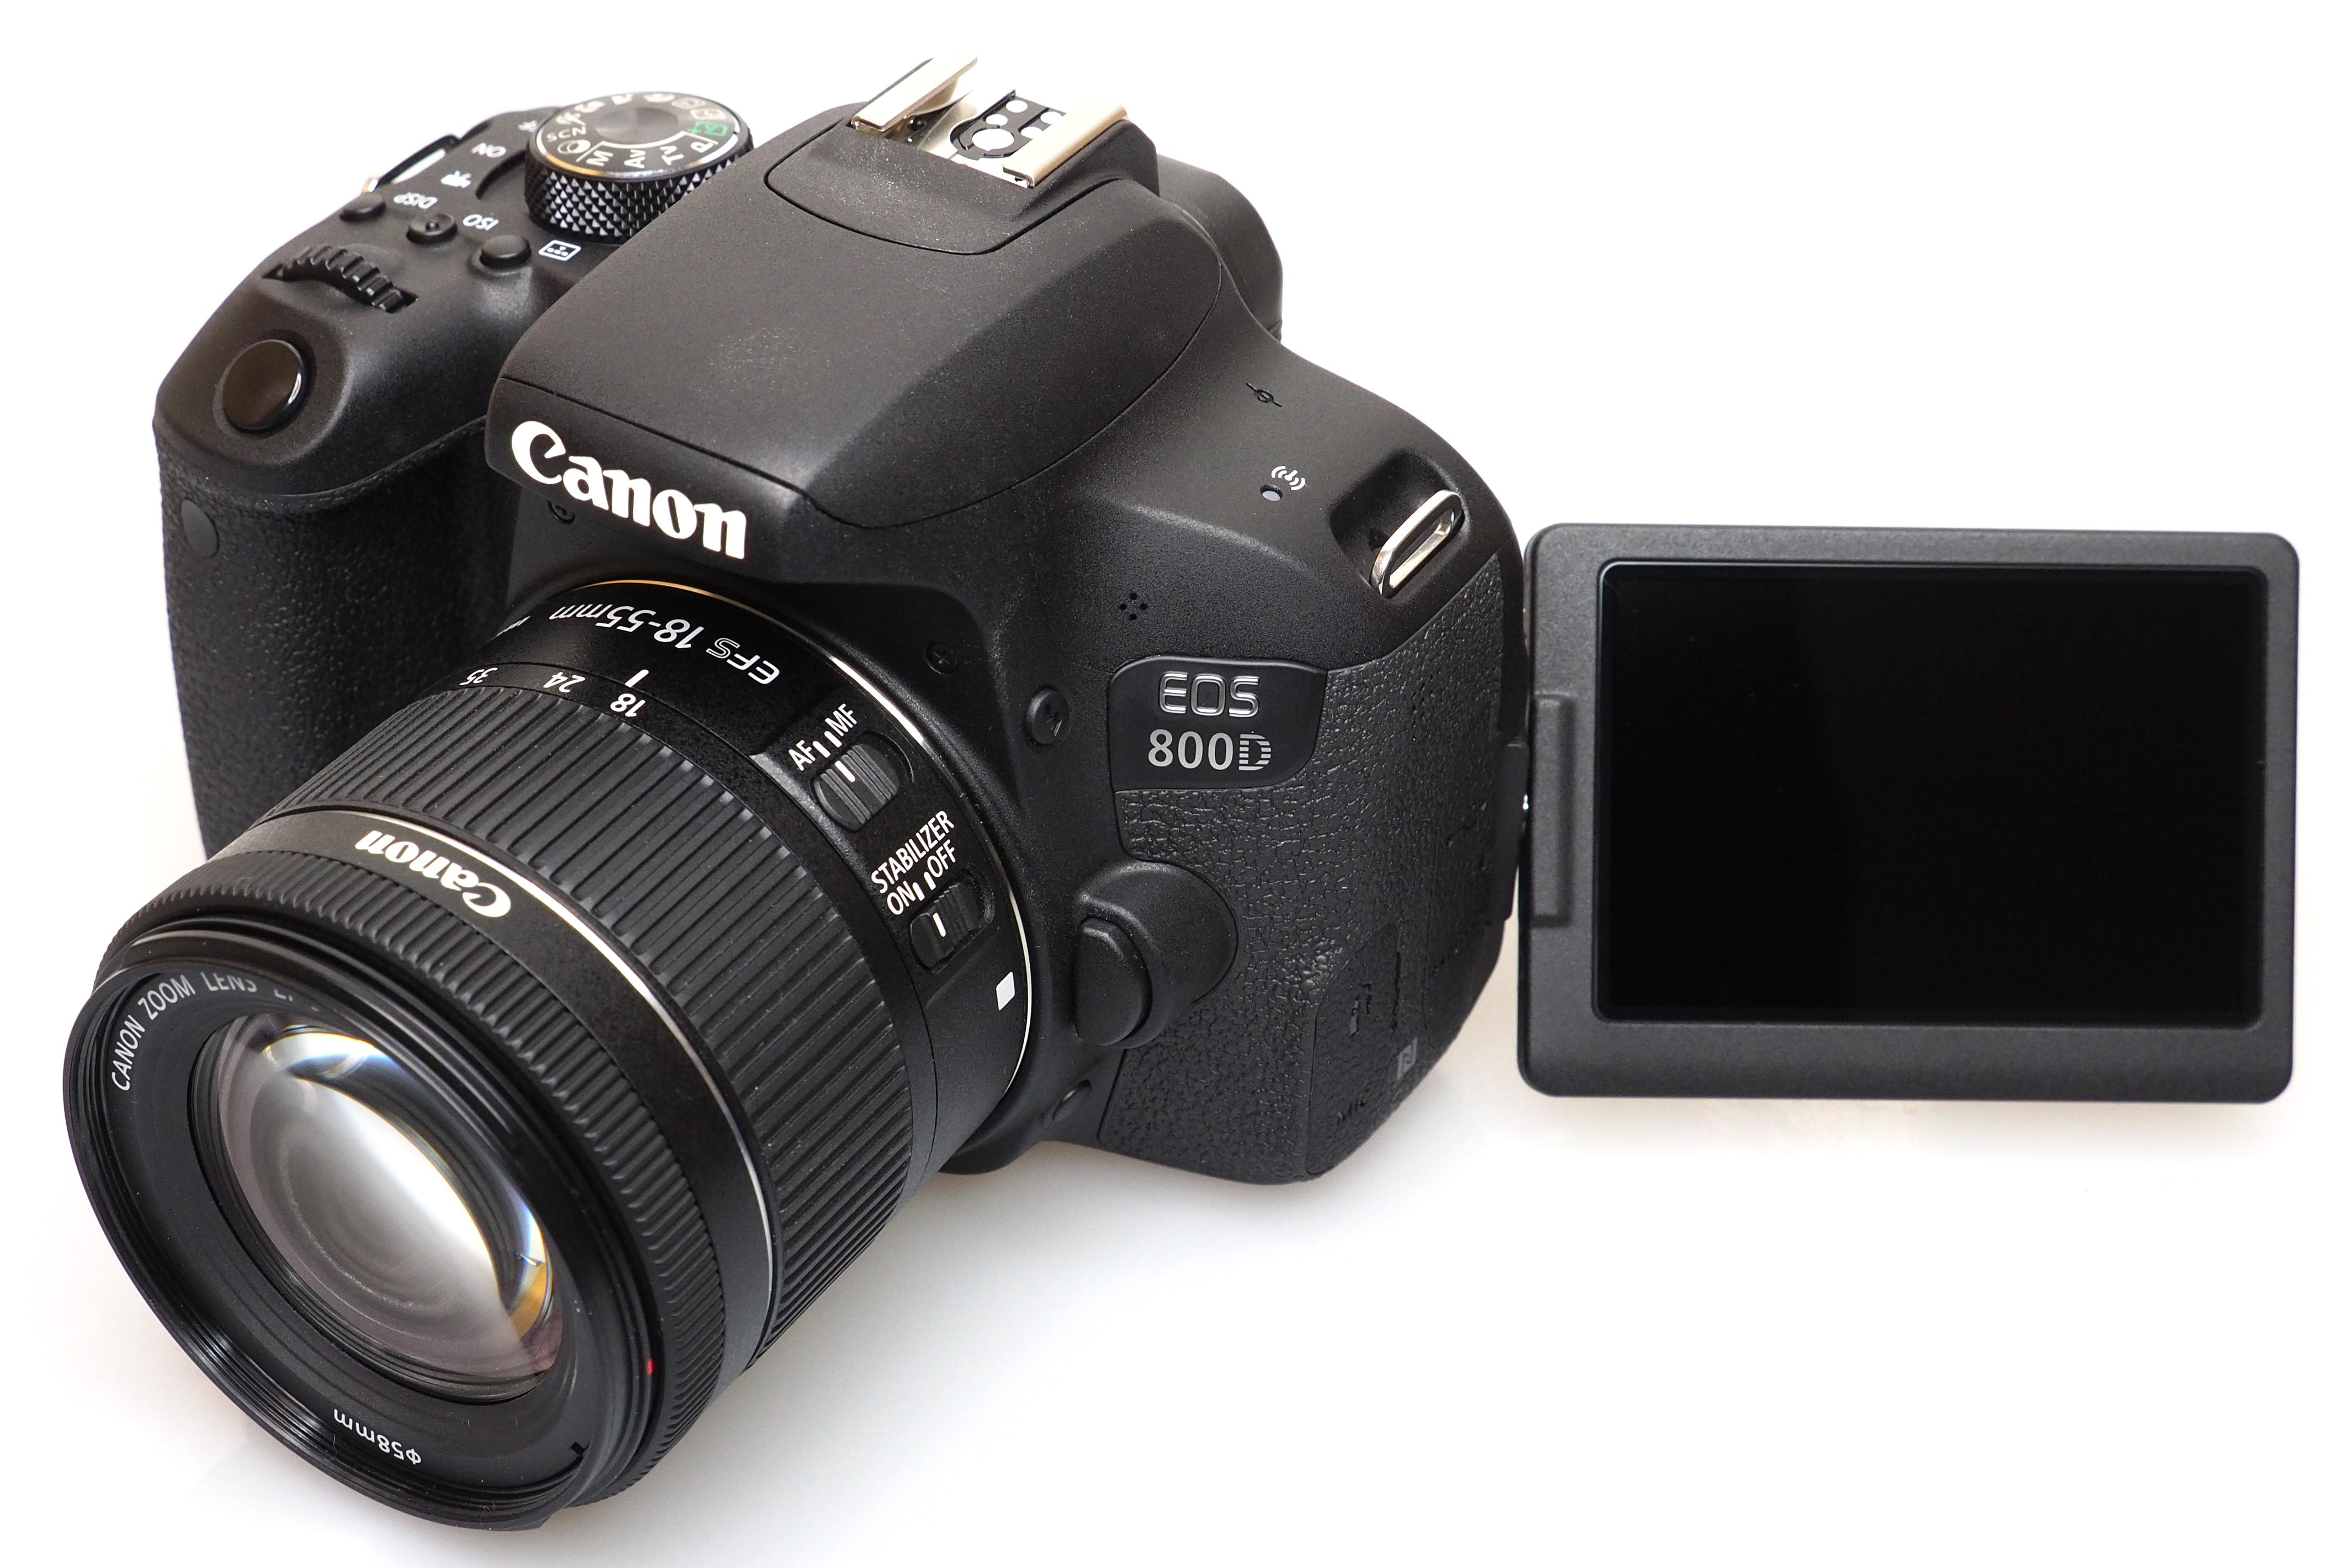 Canon EOS 800D Expert Review | ePHOTOzine